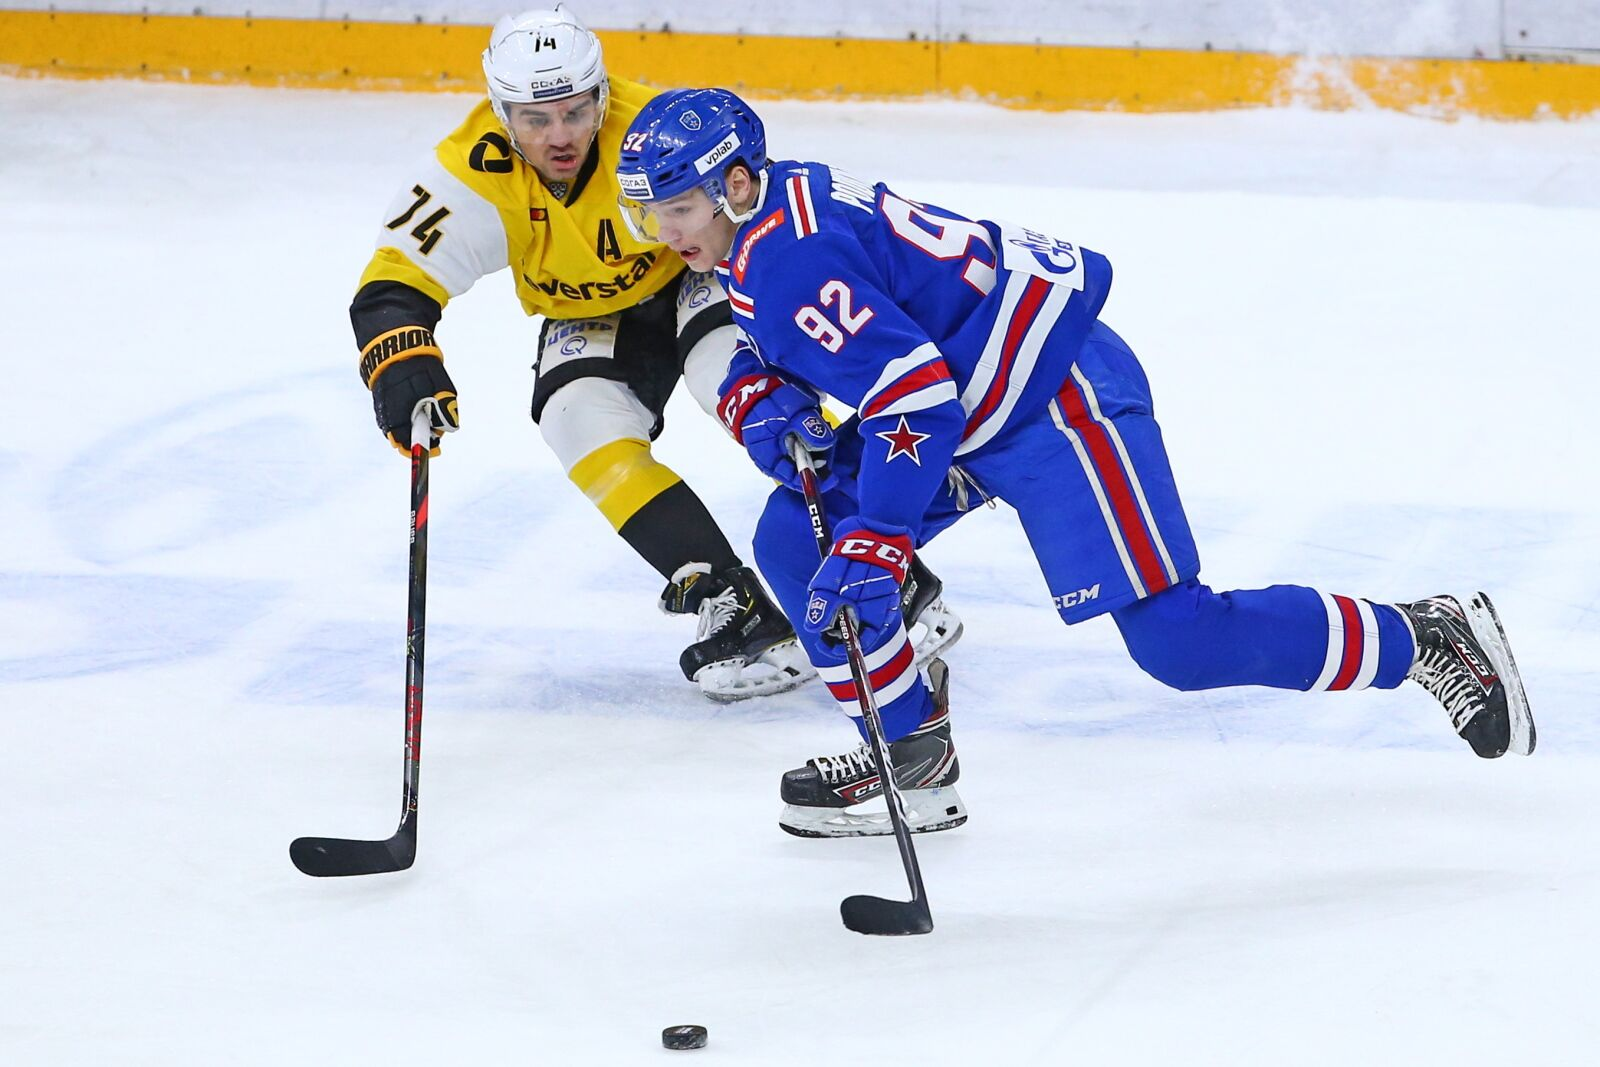 Canucks prospects of week 19: Podkolzin, Silovs and Karlsson